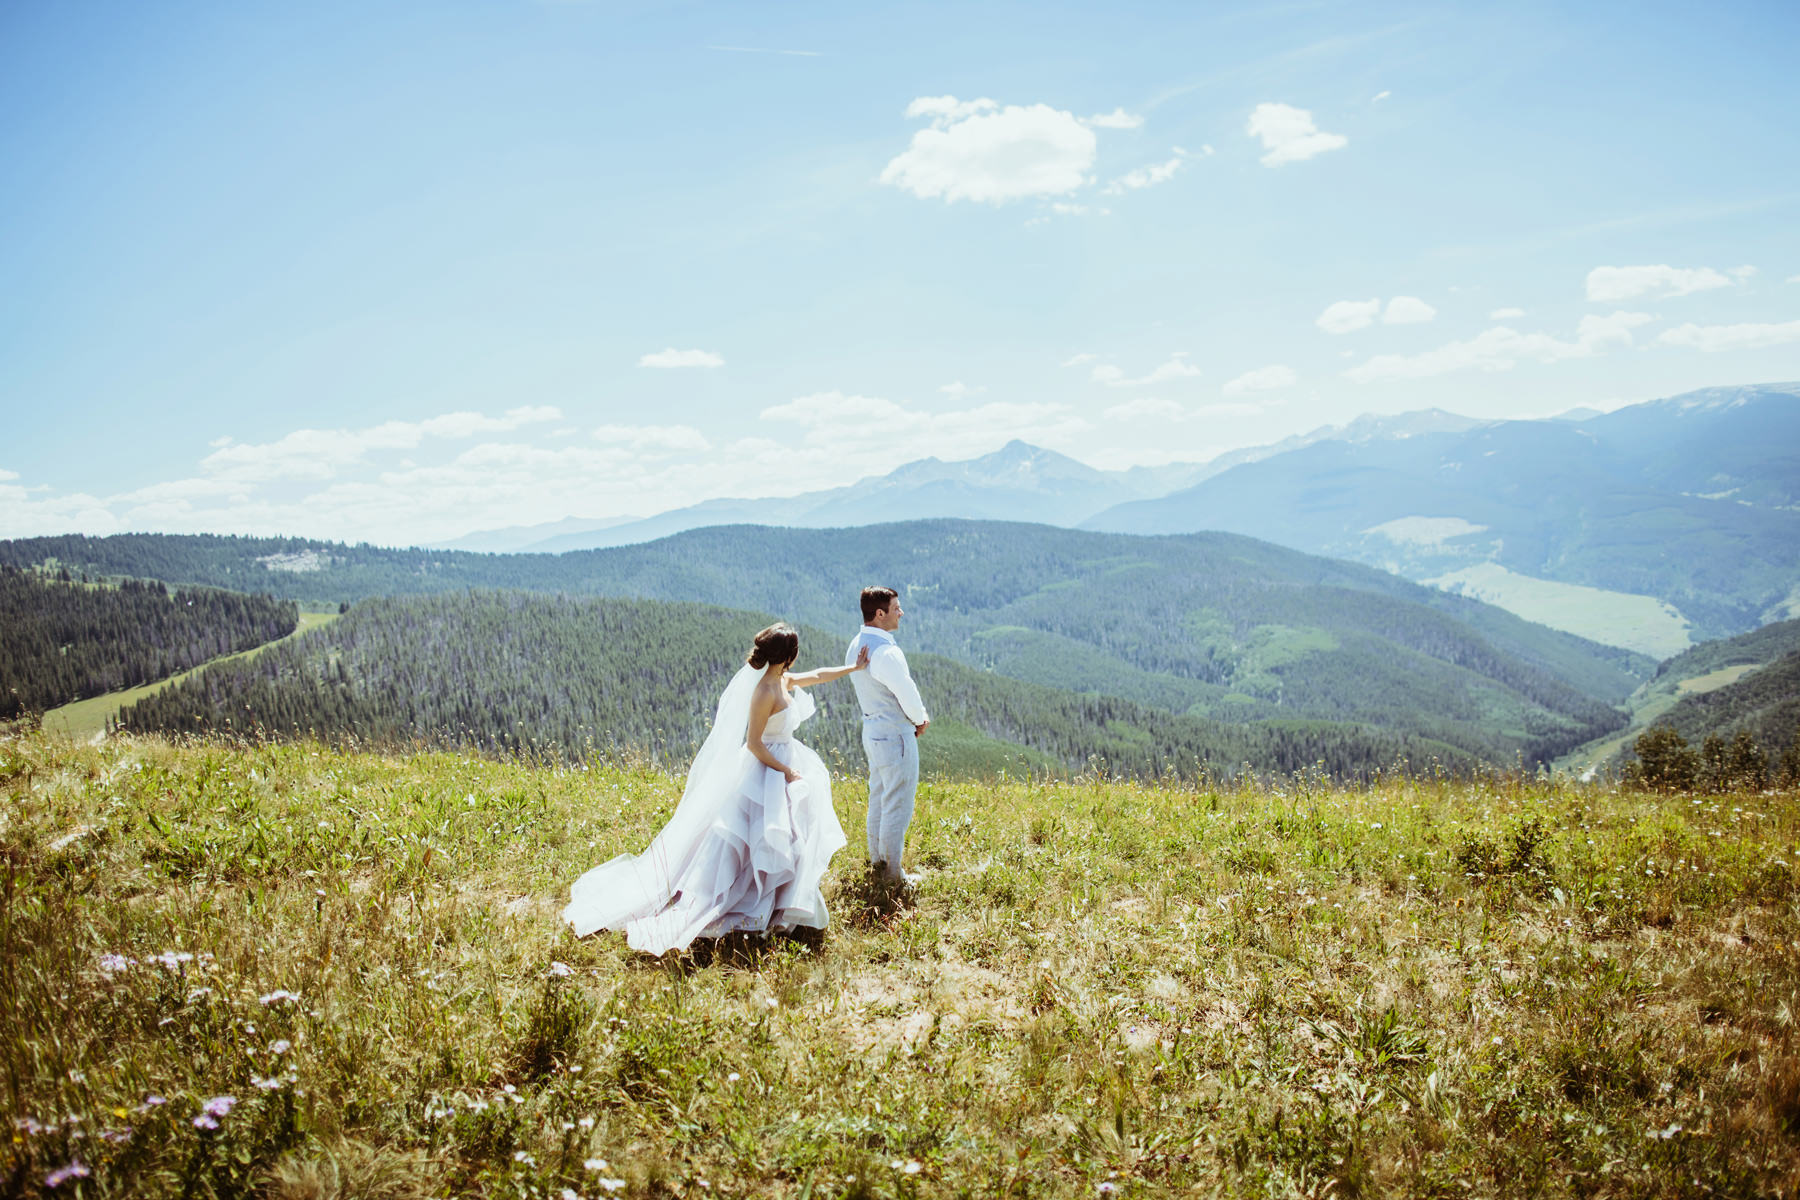 Vail Colorado Wedding Deck_ Kindling Wedding Photography20.JPG